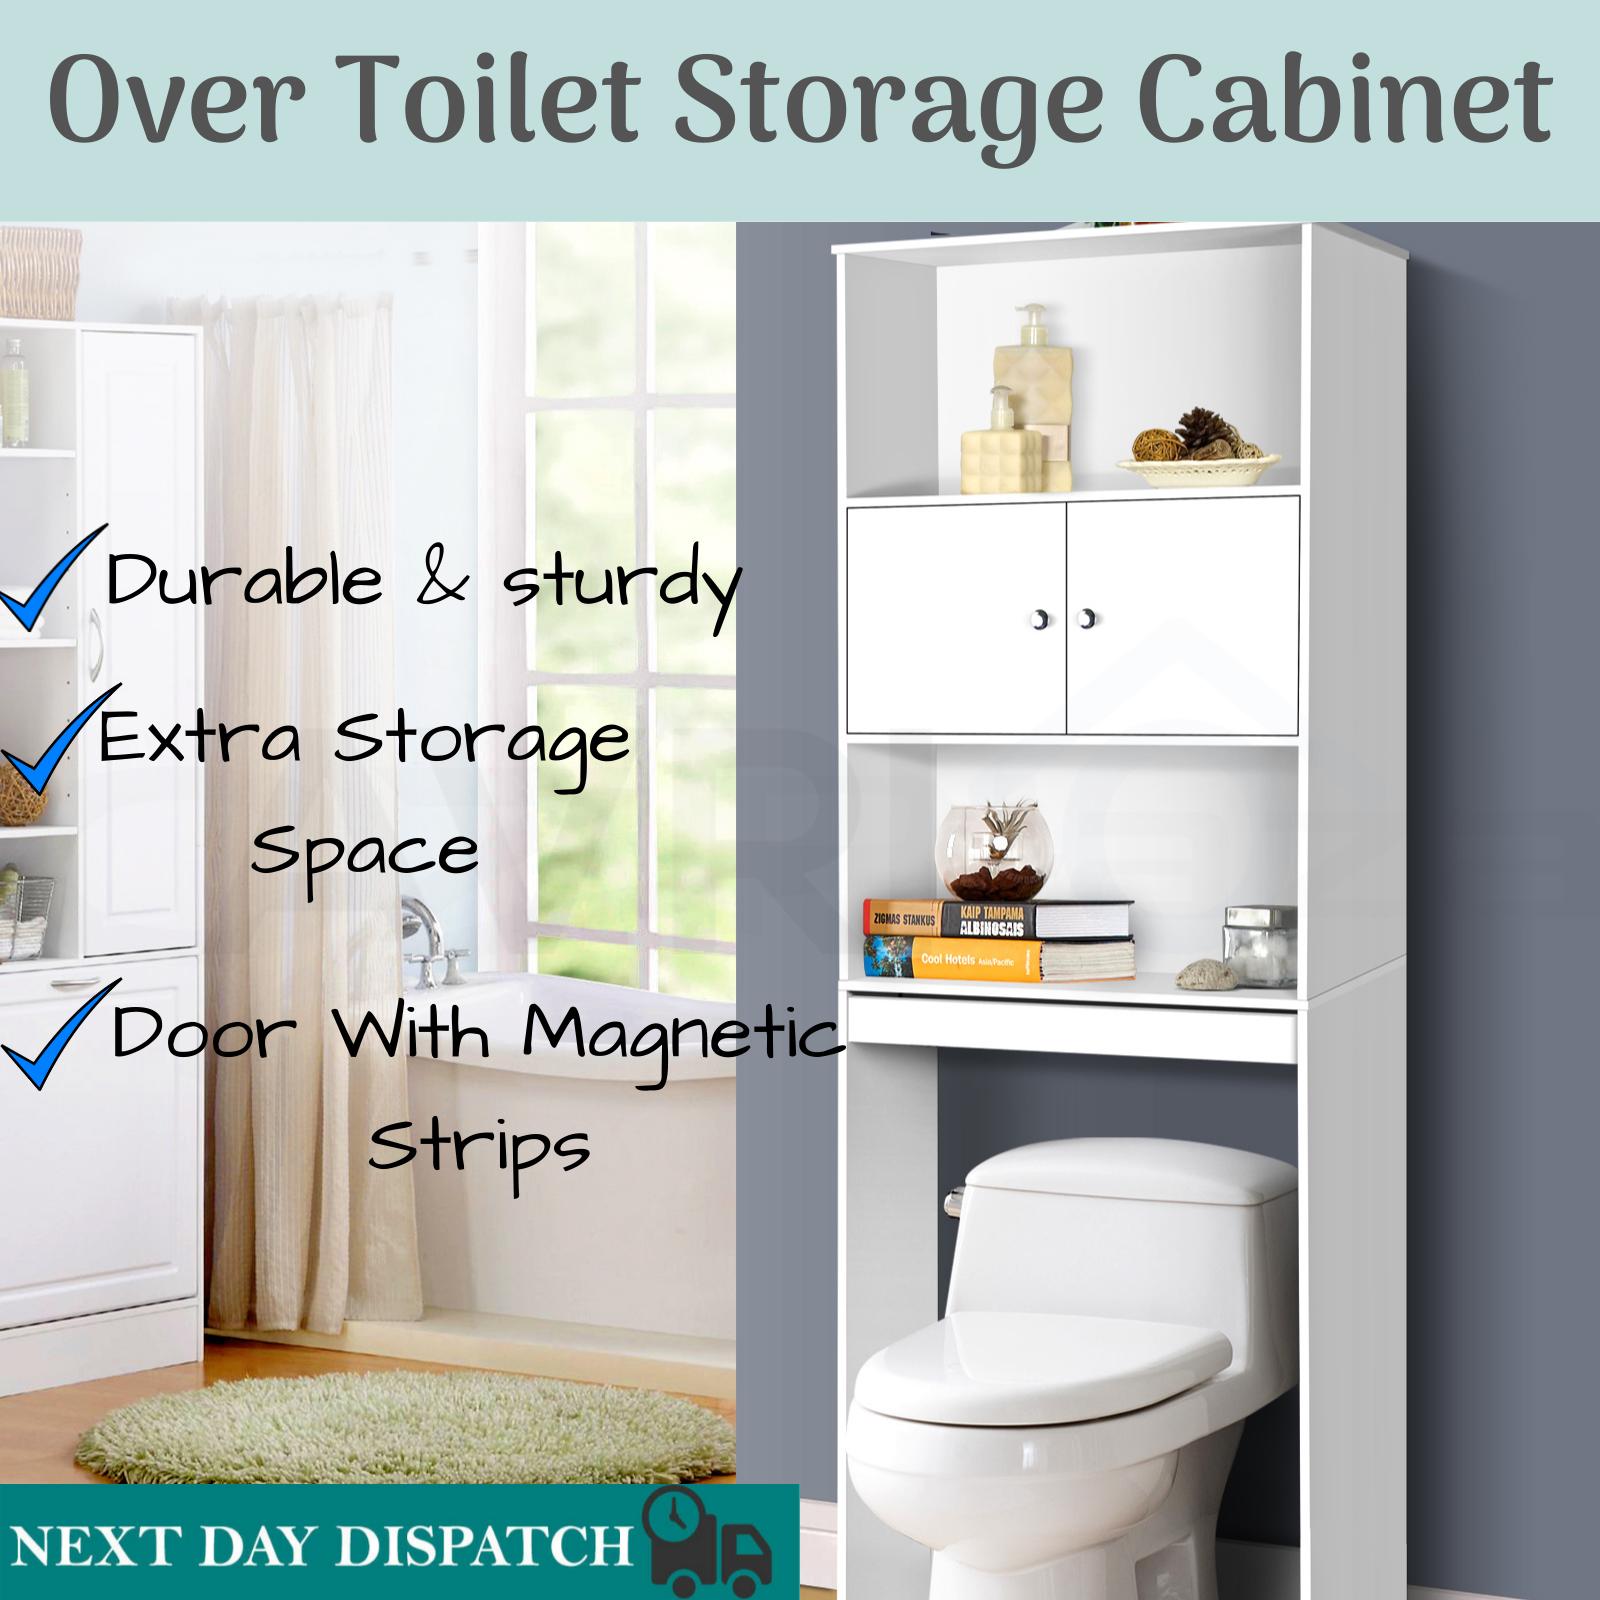 Toilet Storage Cabinet Shelf Above